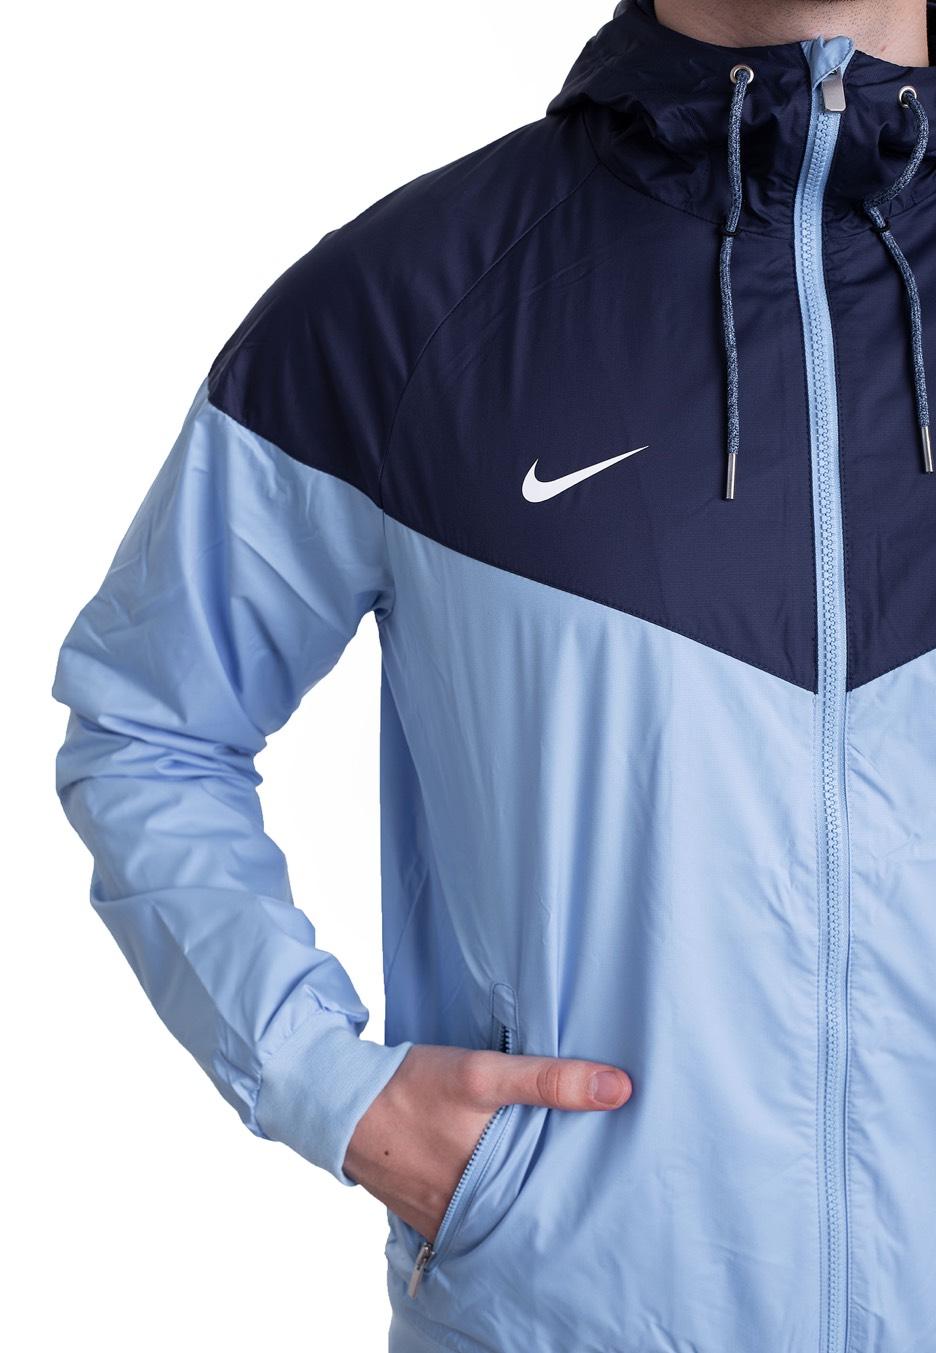 af7238516336 Nike - Manchester City FC Windrunner Field Blue Midnight Navy White - Dzseki